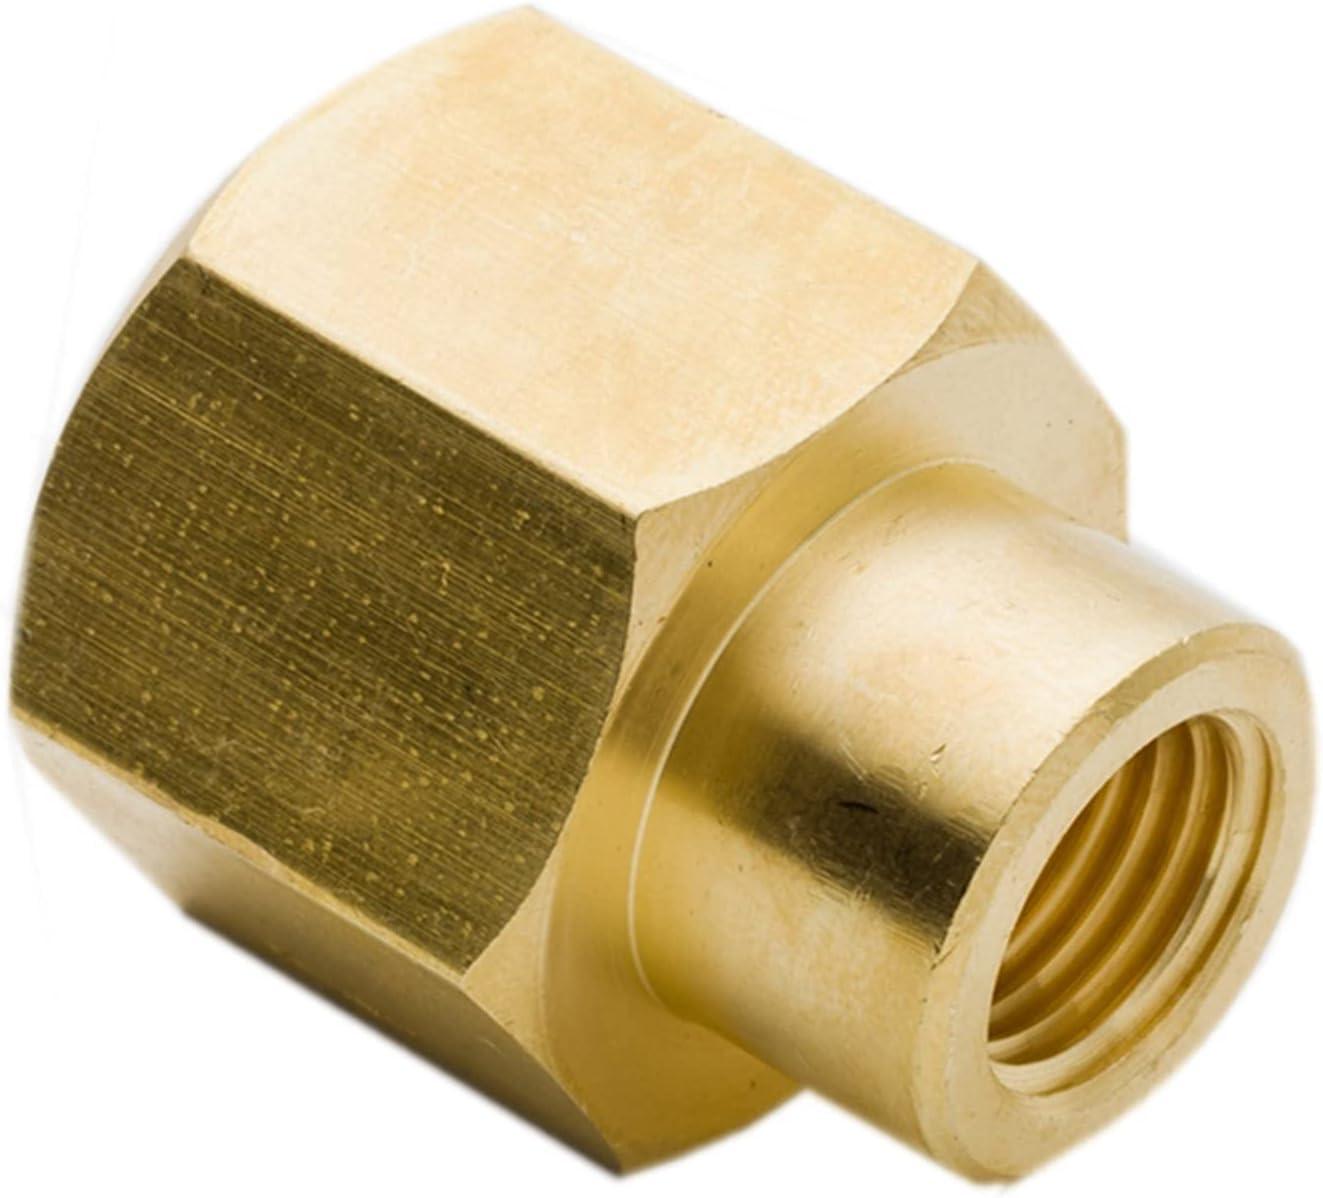 Zkenyao-Brass Connector 2pcs NPT Limited price Thread 1 Bras 4